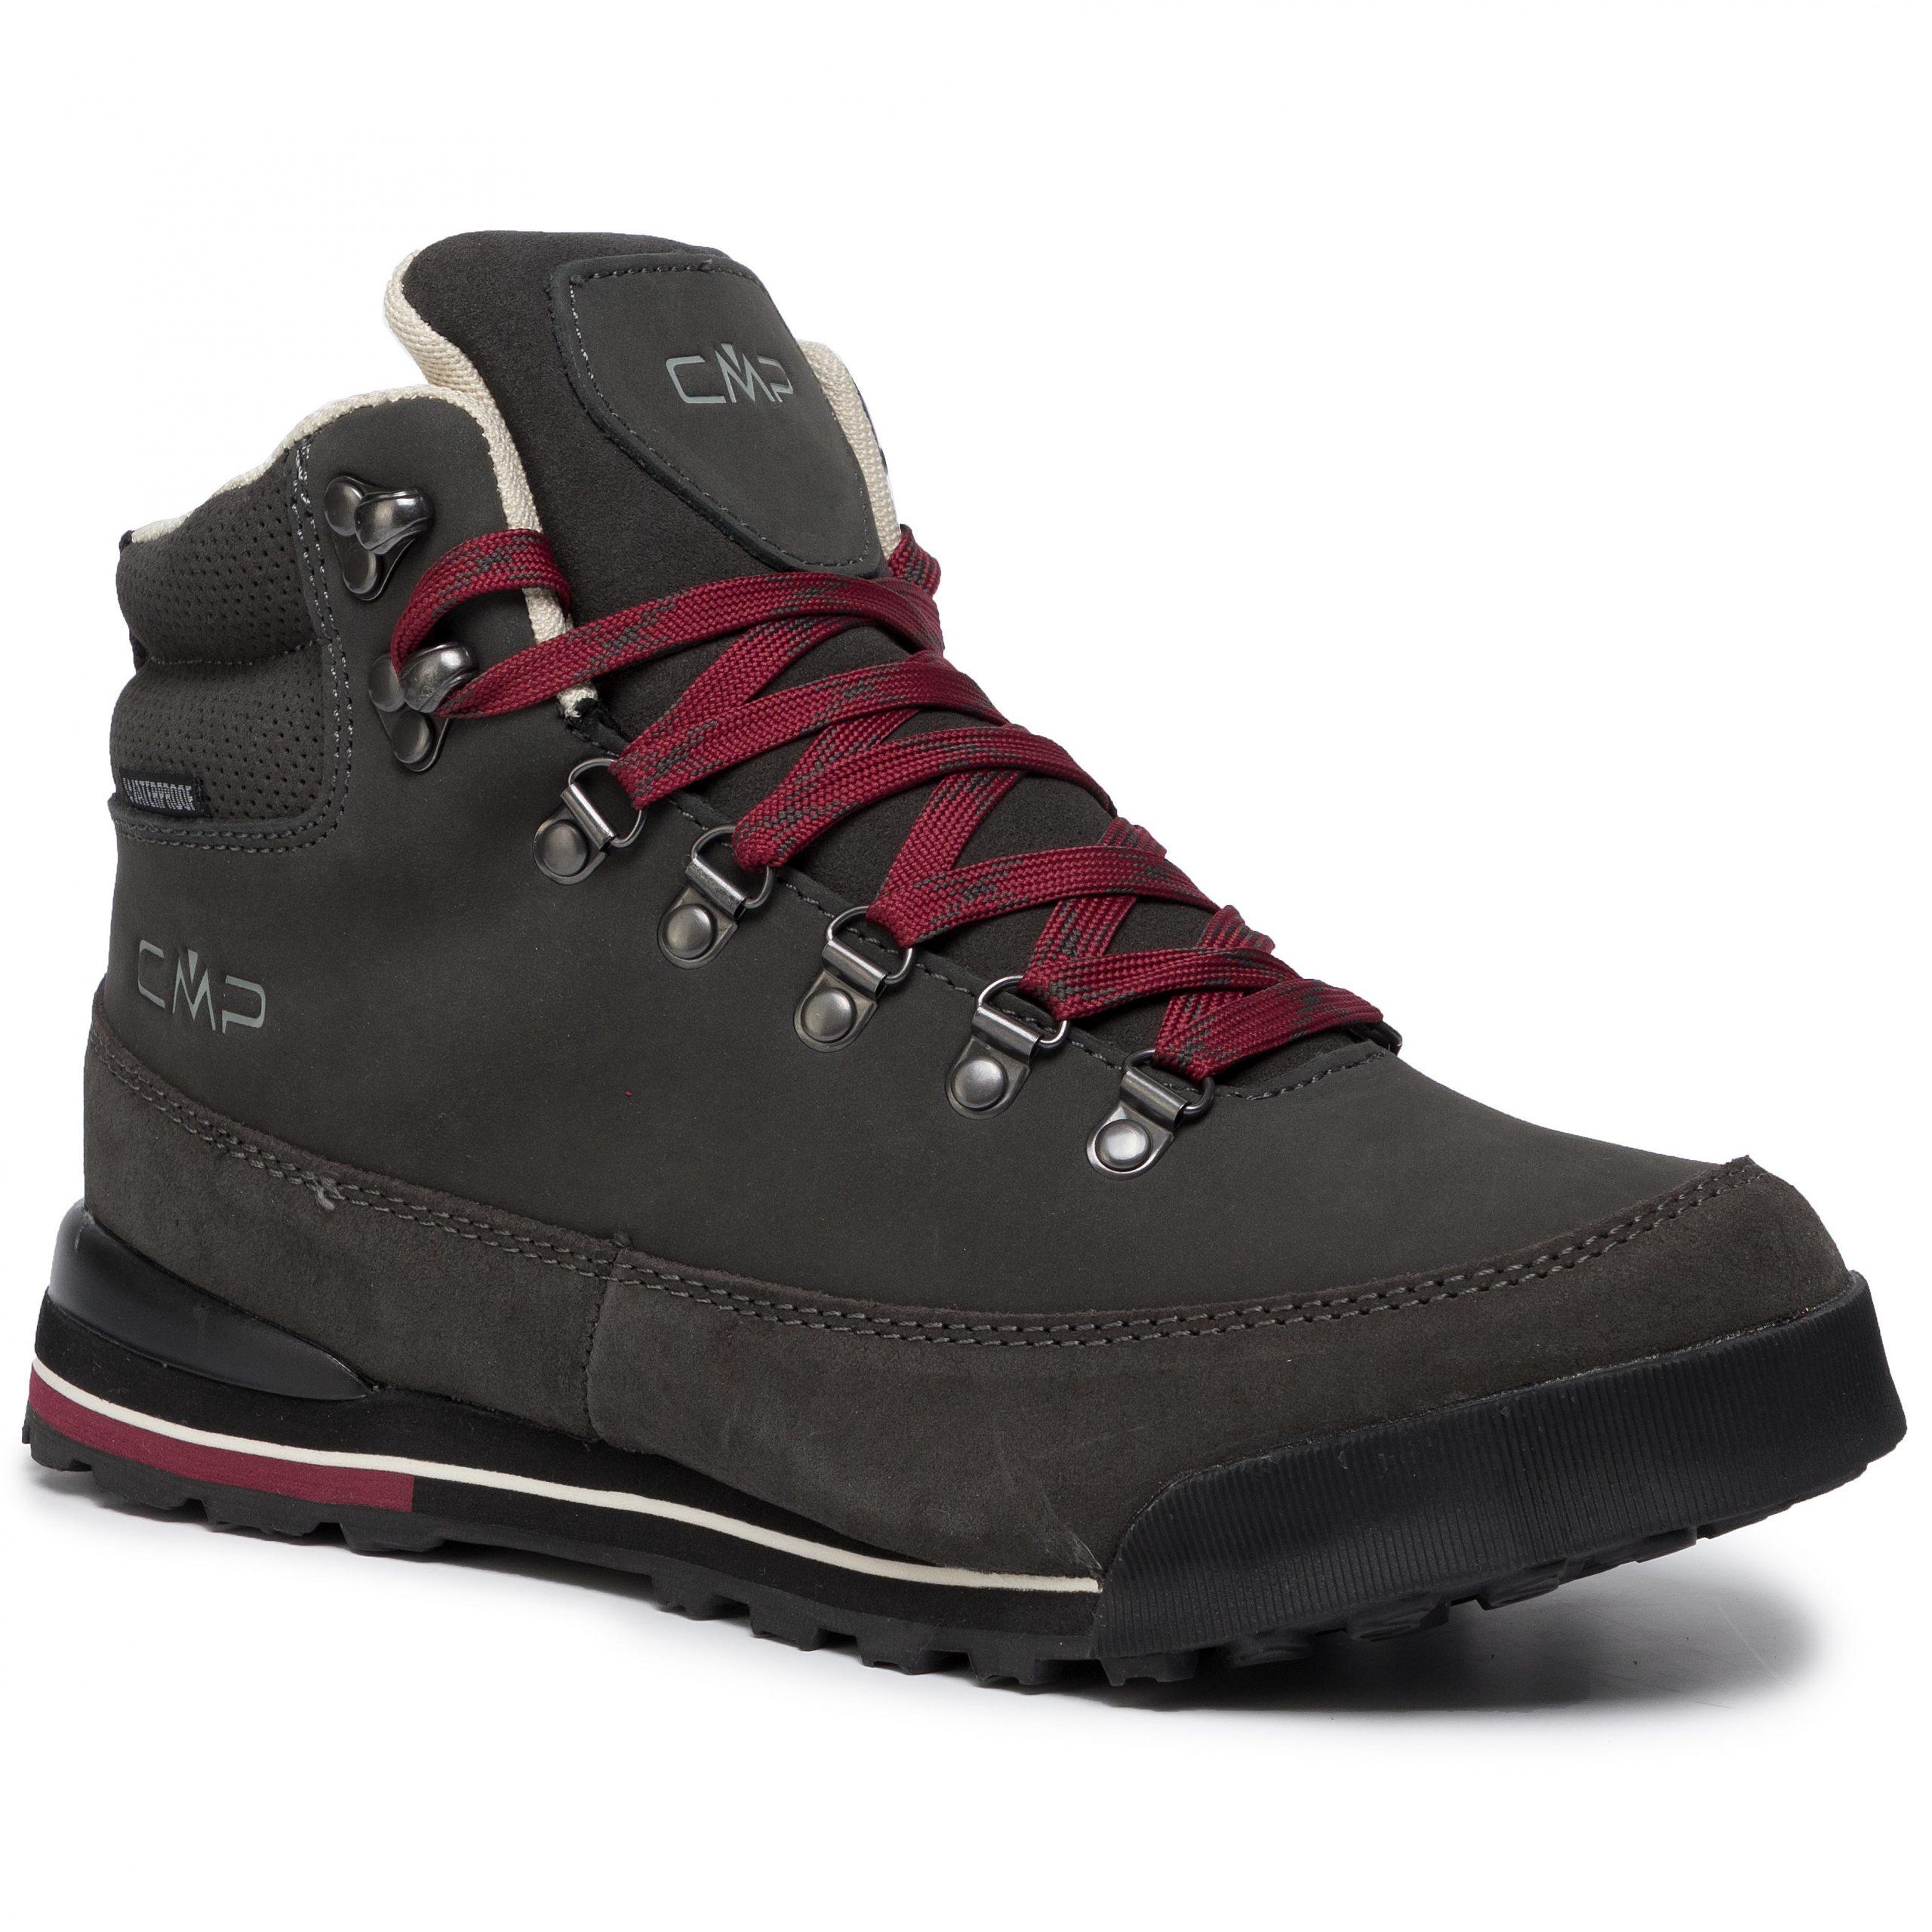 Trekkings CMP - Heka Hikking Shoes Wp 3Q49557 Arabica/Syrah 68BN